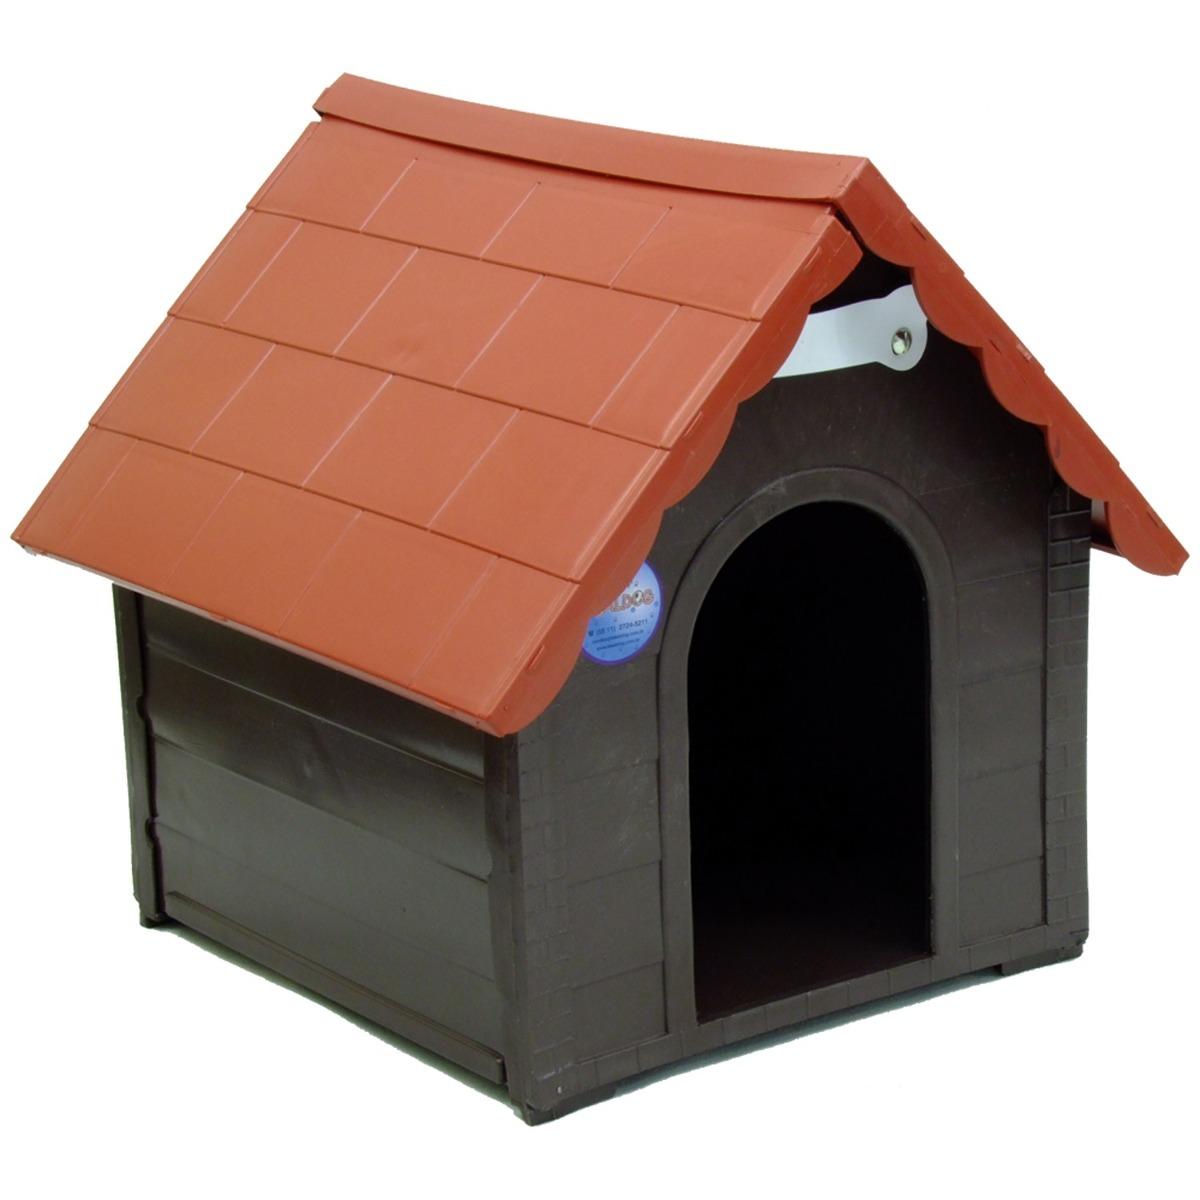 Casa Para Cães Plástica Desmontável P 36 X 28 X 35